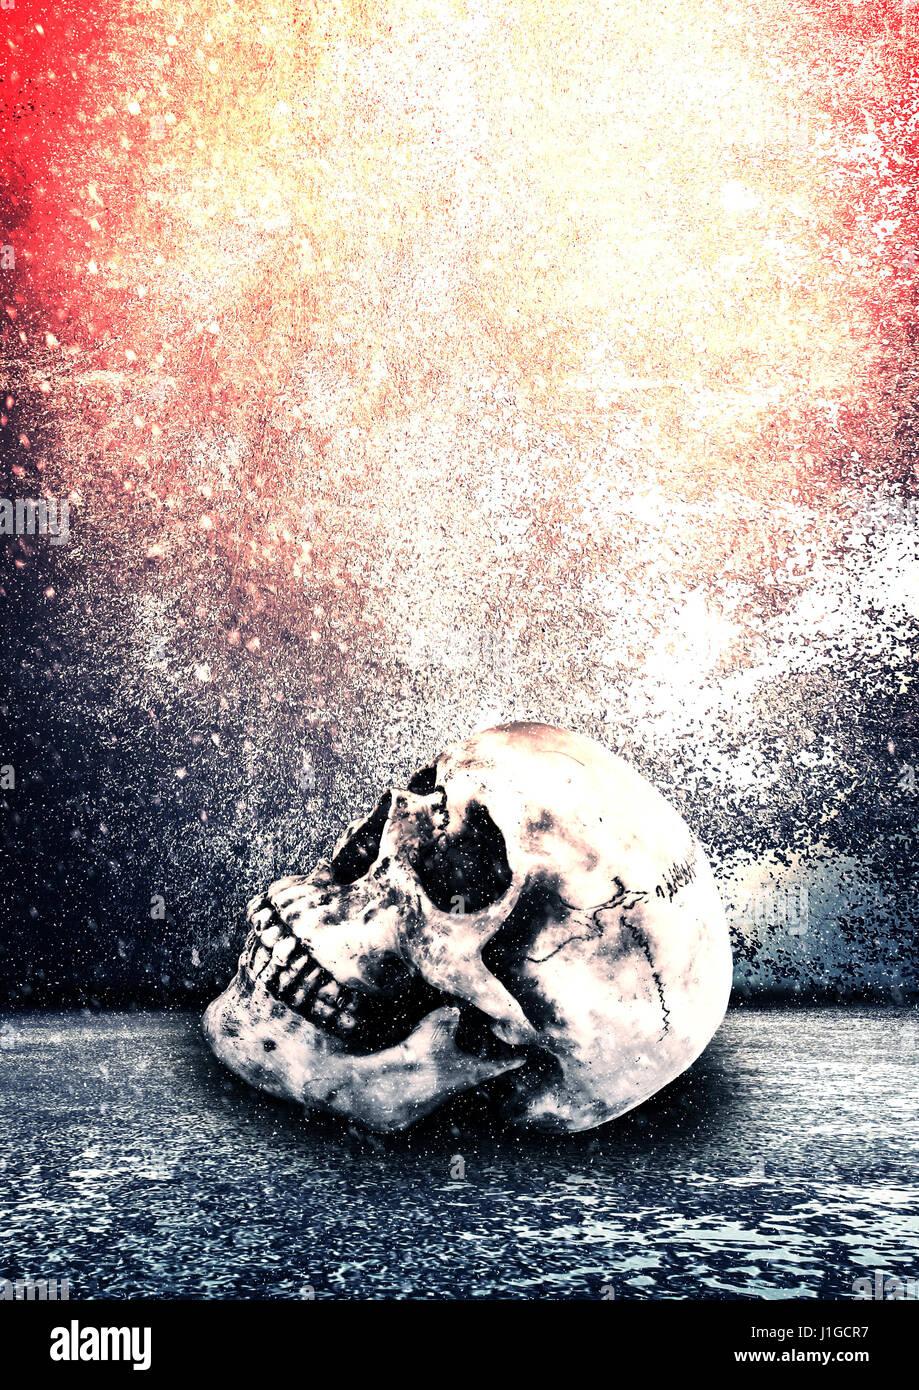 88 Film Poster Design Background Create A Fun Horror Movie Poster